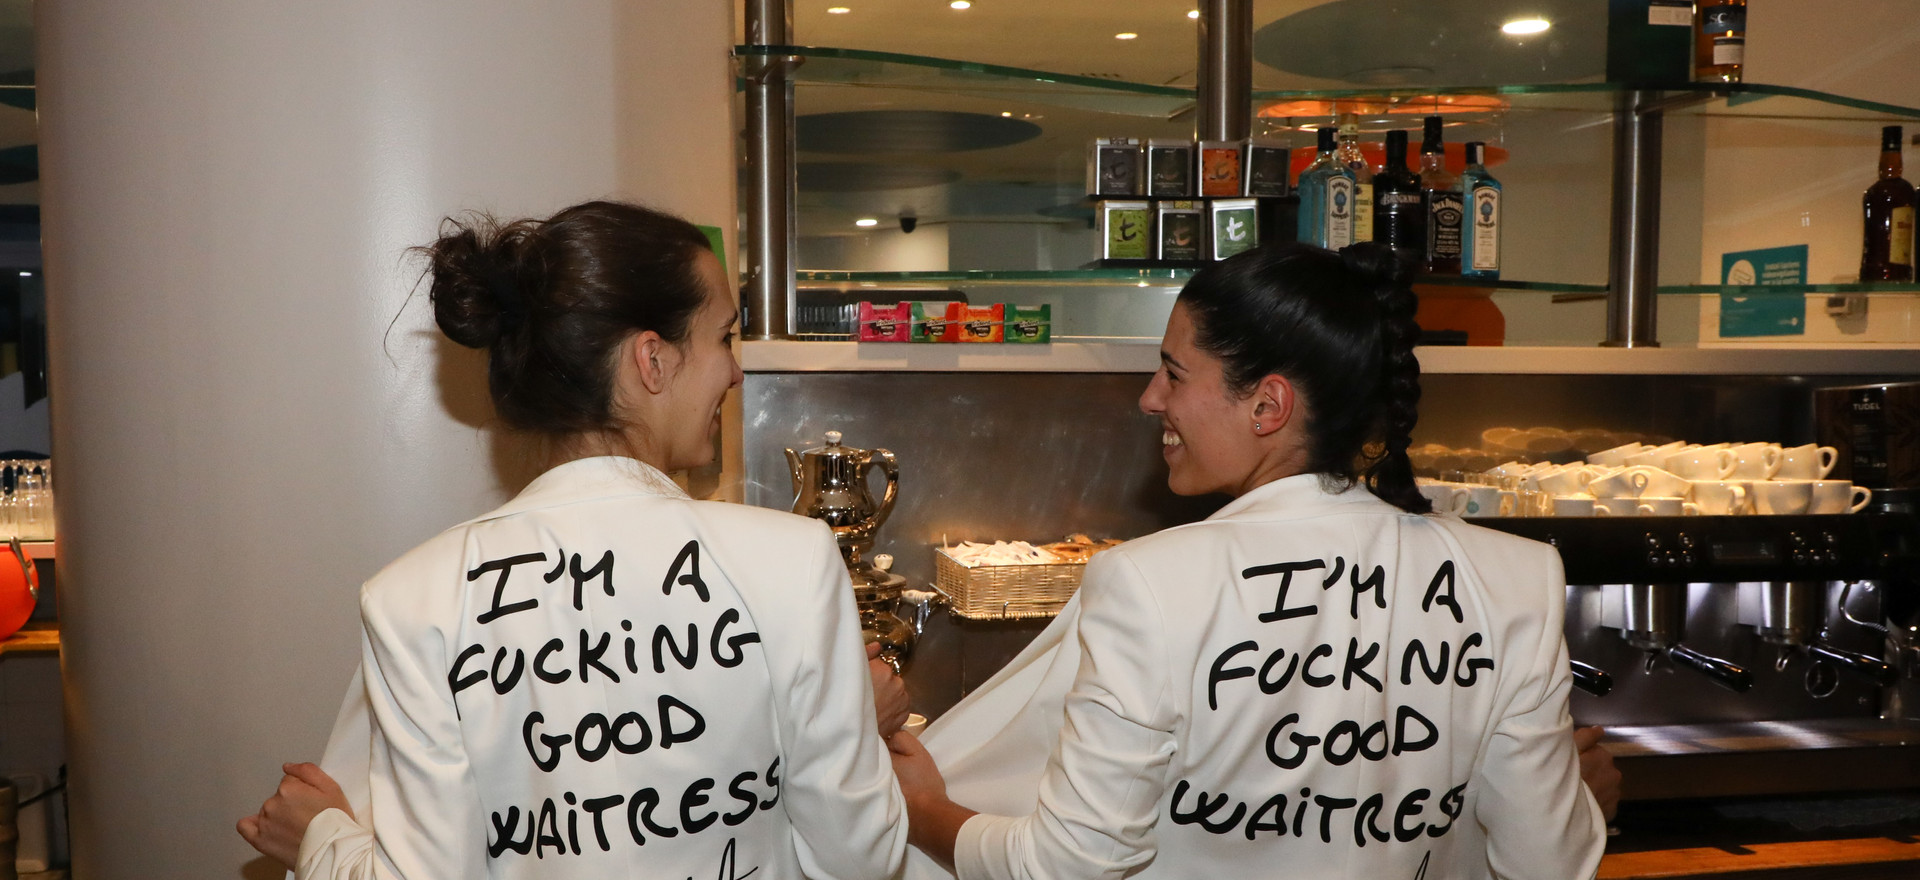 I'm A Fucking Good Waitress